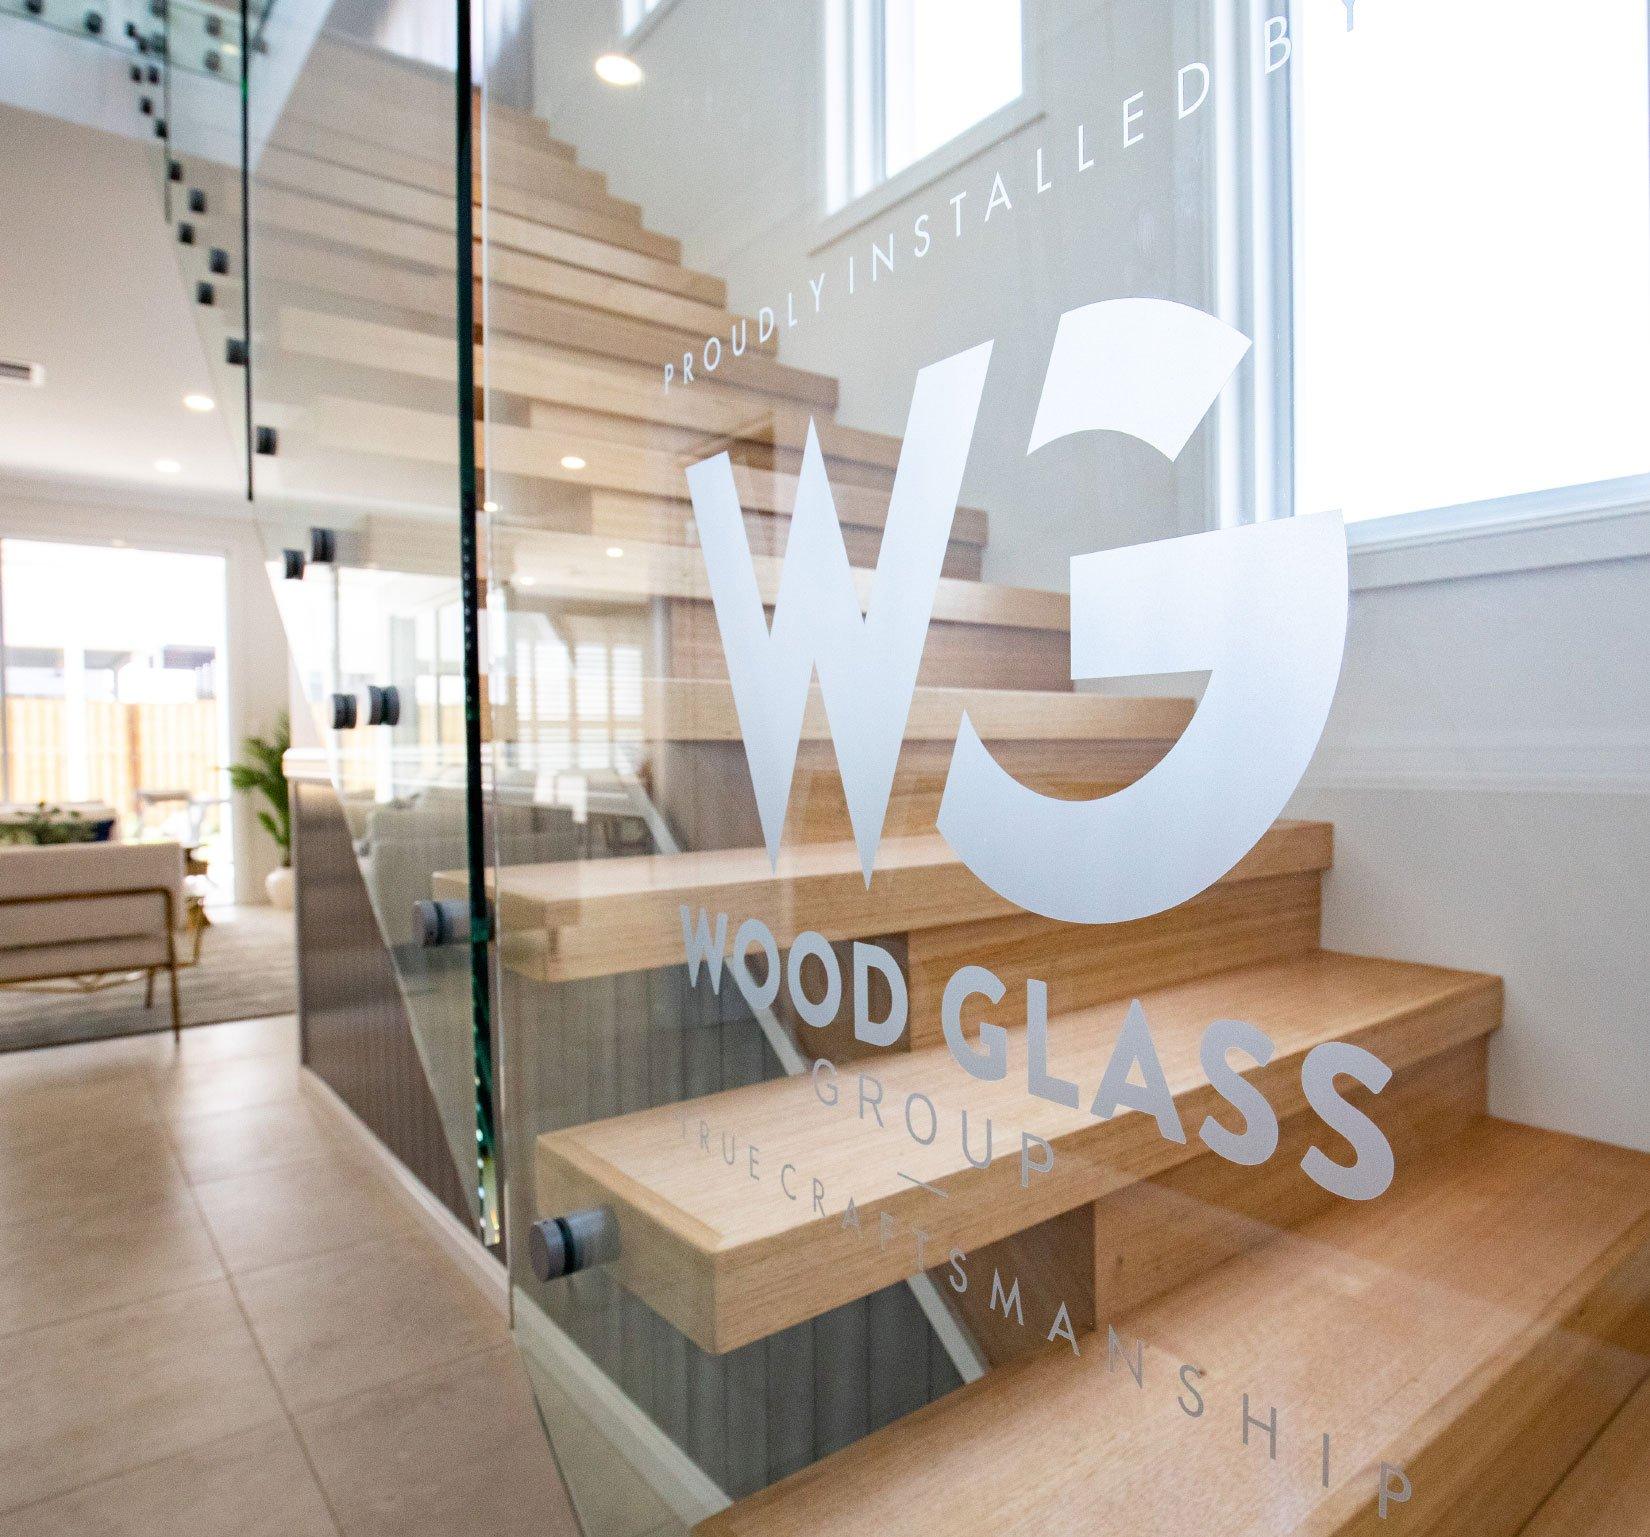 Wood Glass Group Custom Fabrication